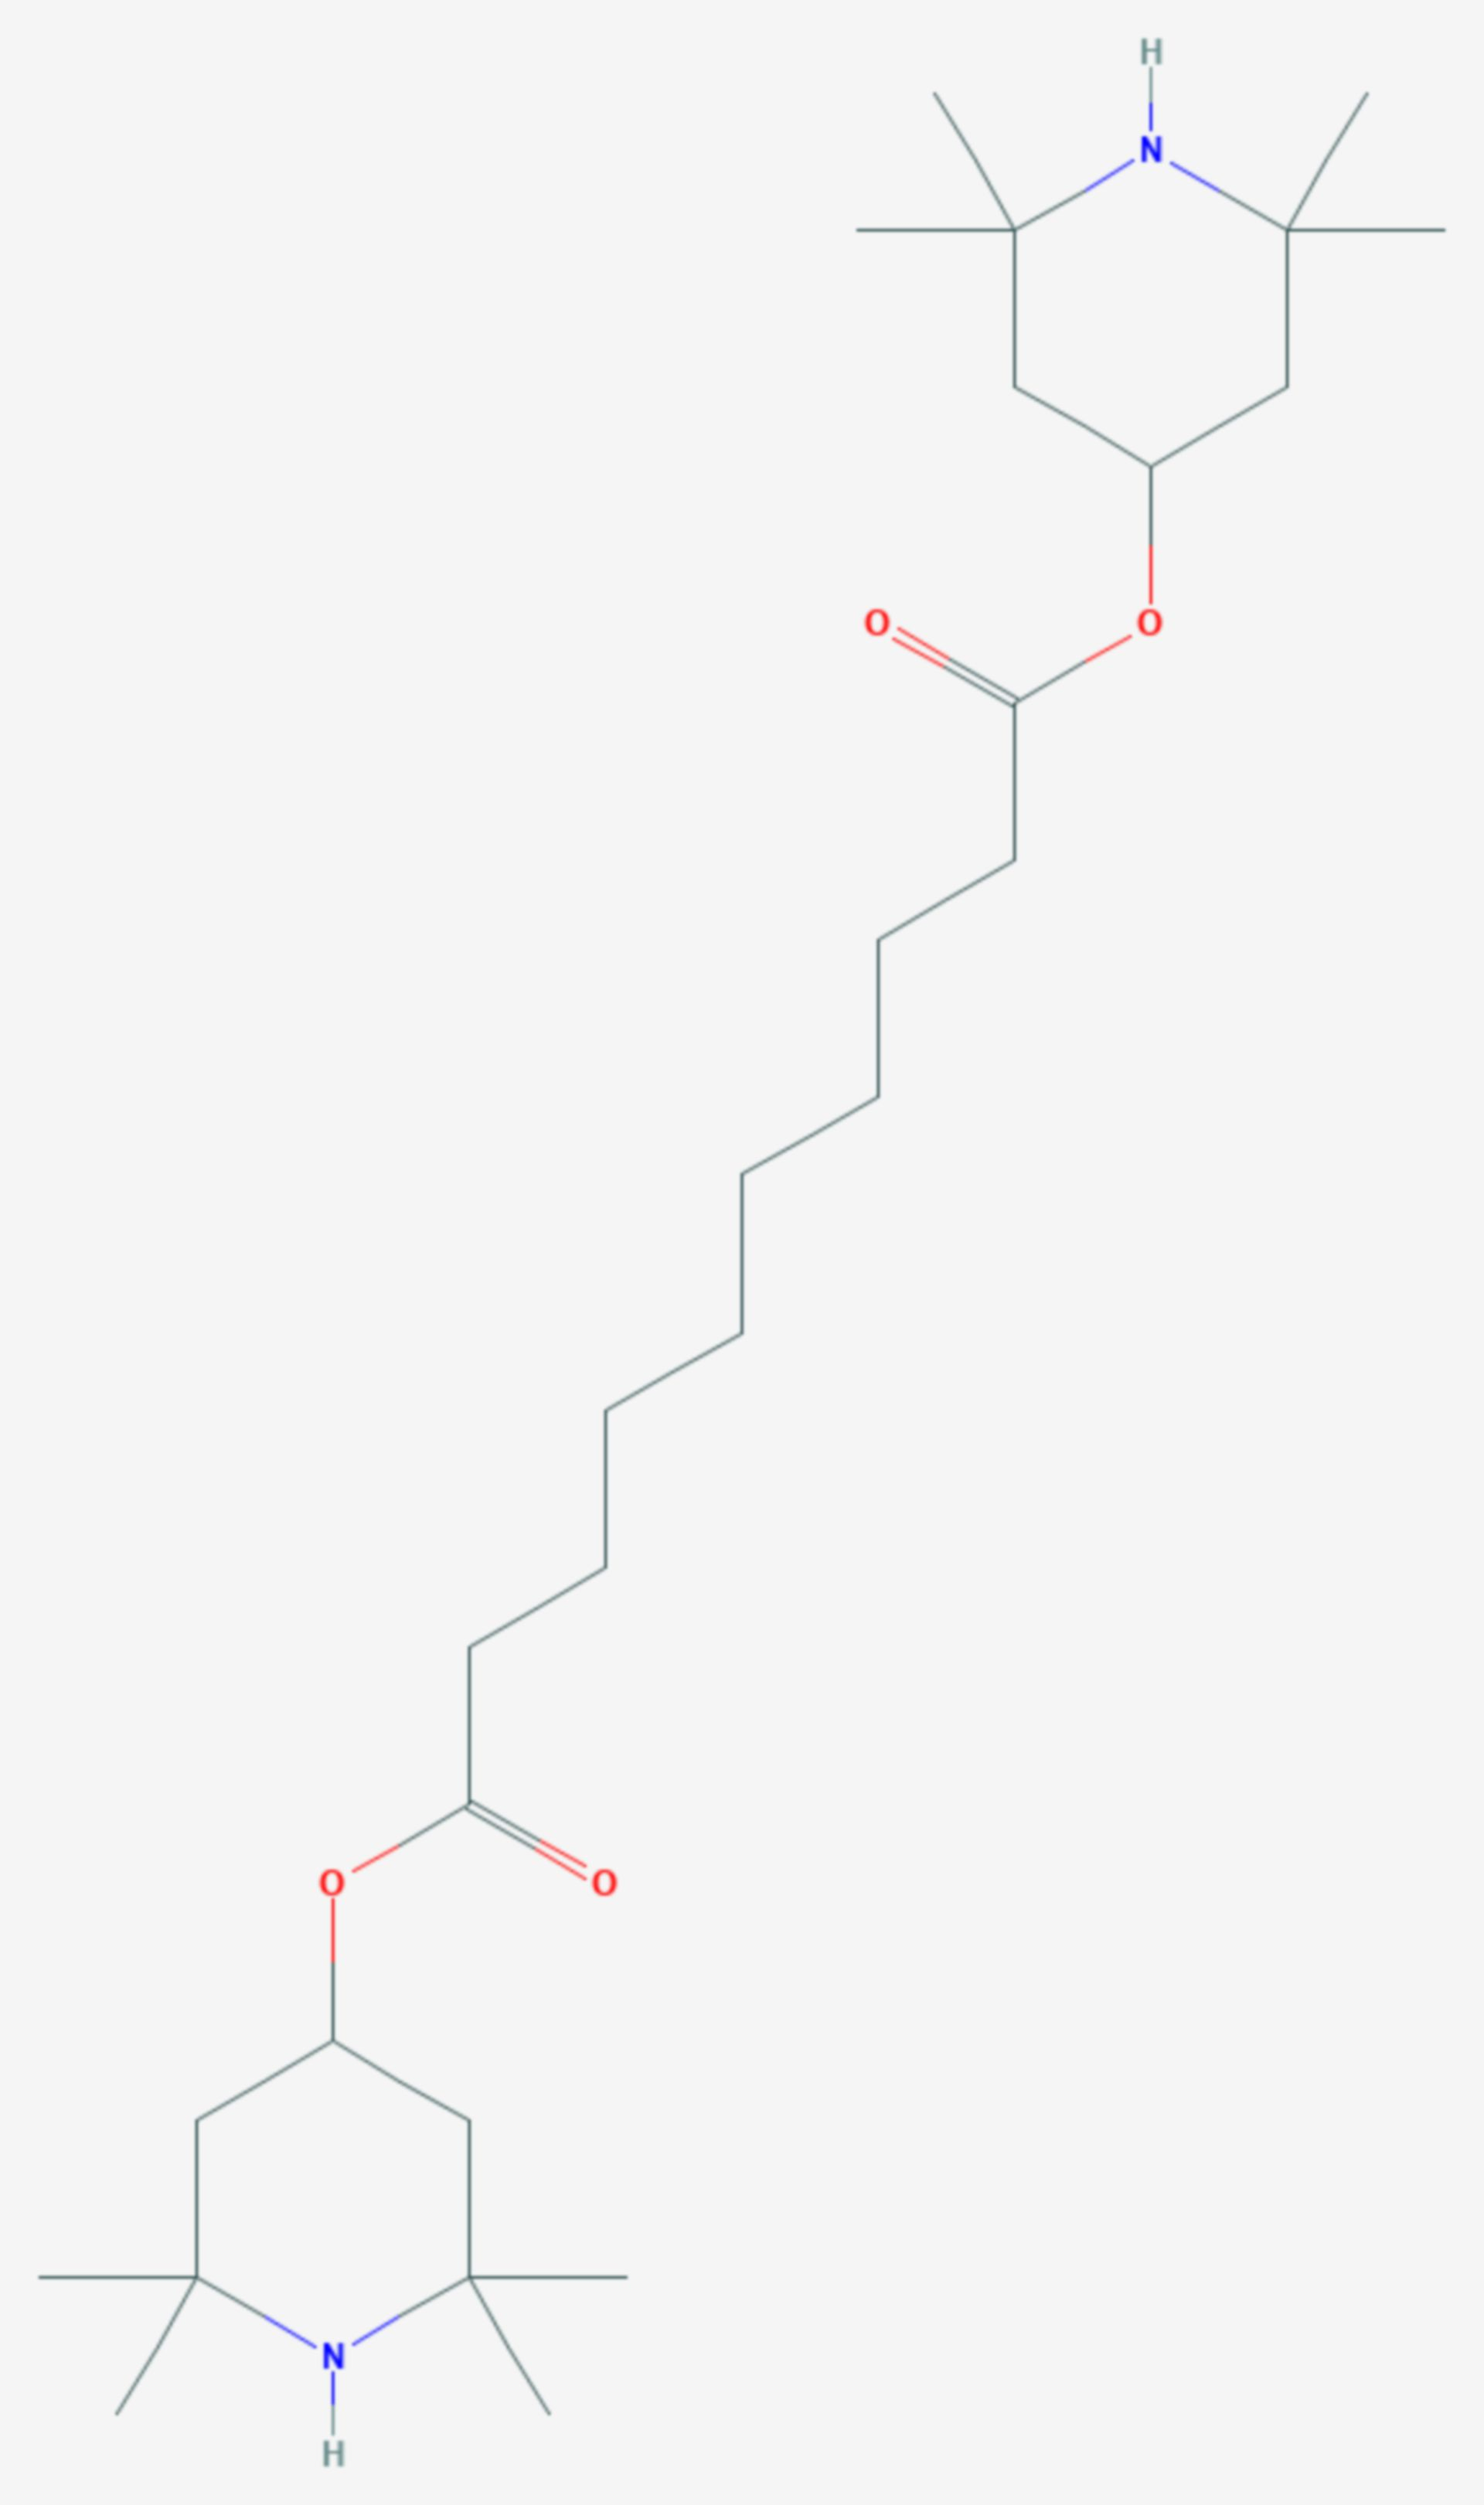 Bis(2,2,6,6-tetramethyl-4-piperidyl)sebacat (Strukturformel)